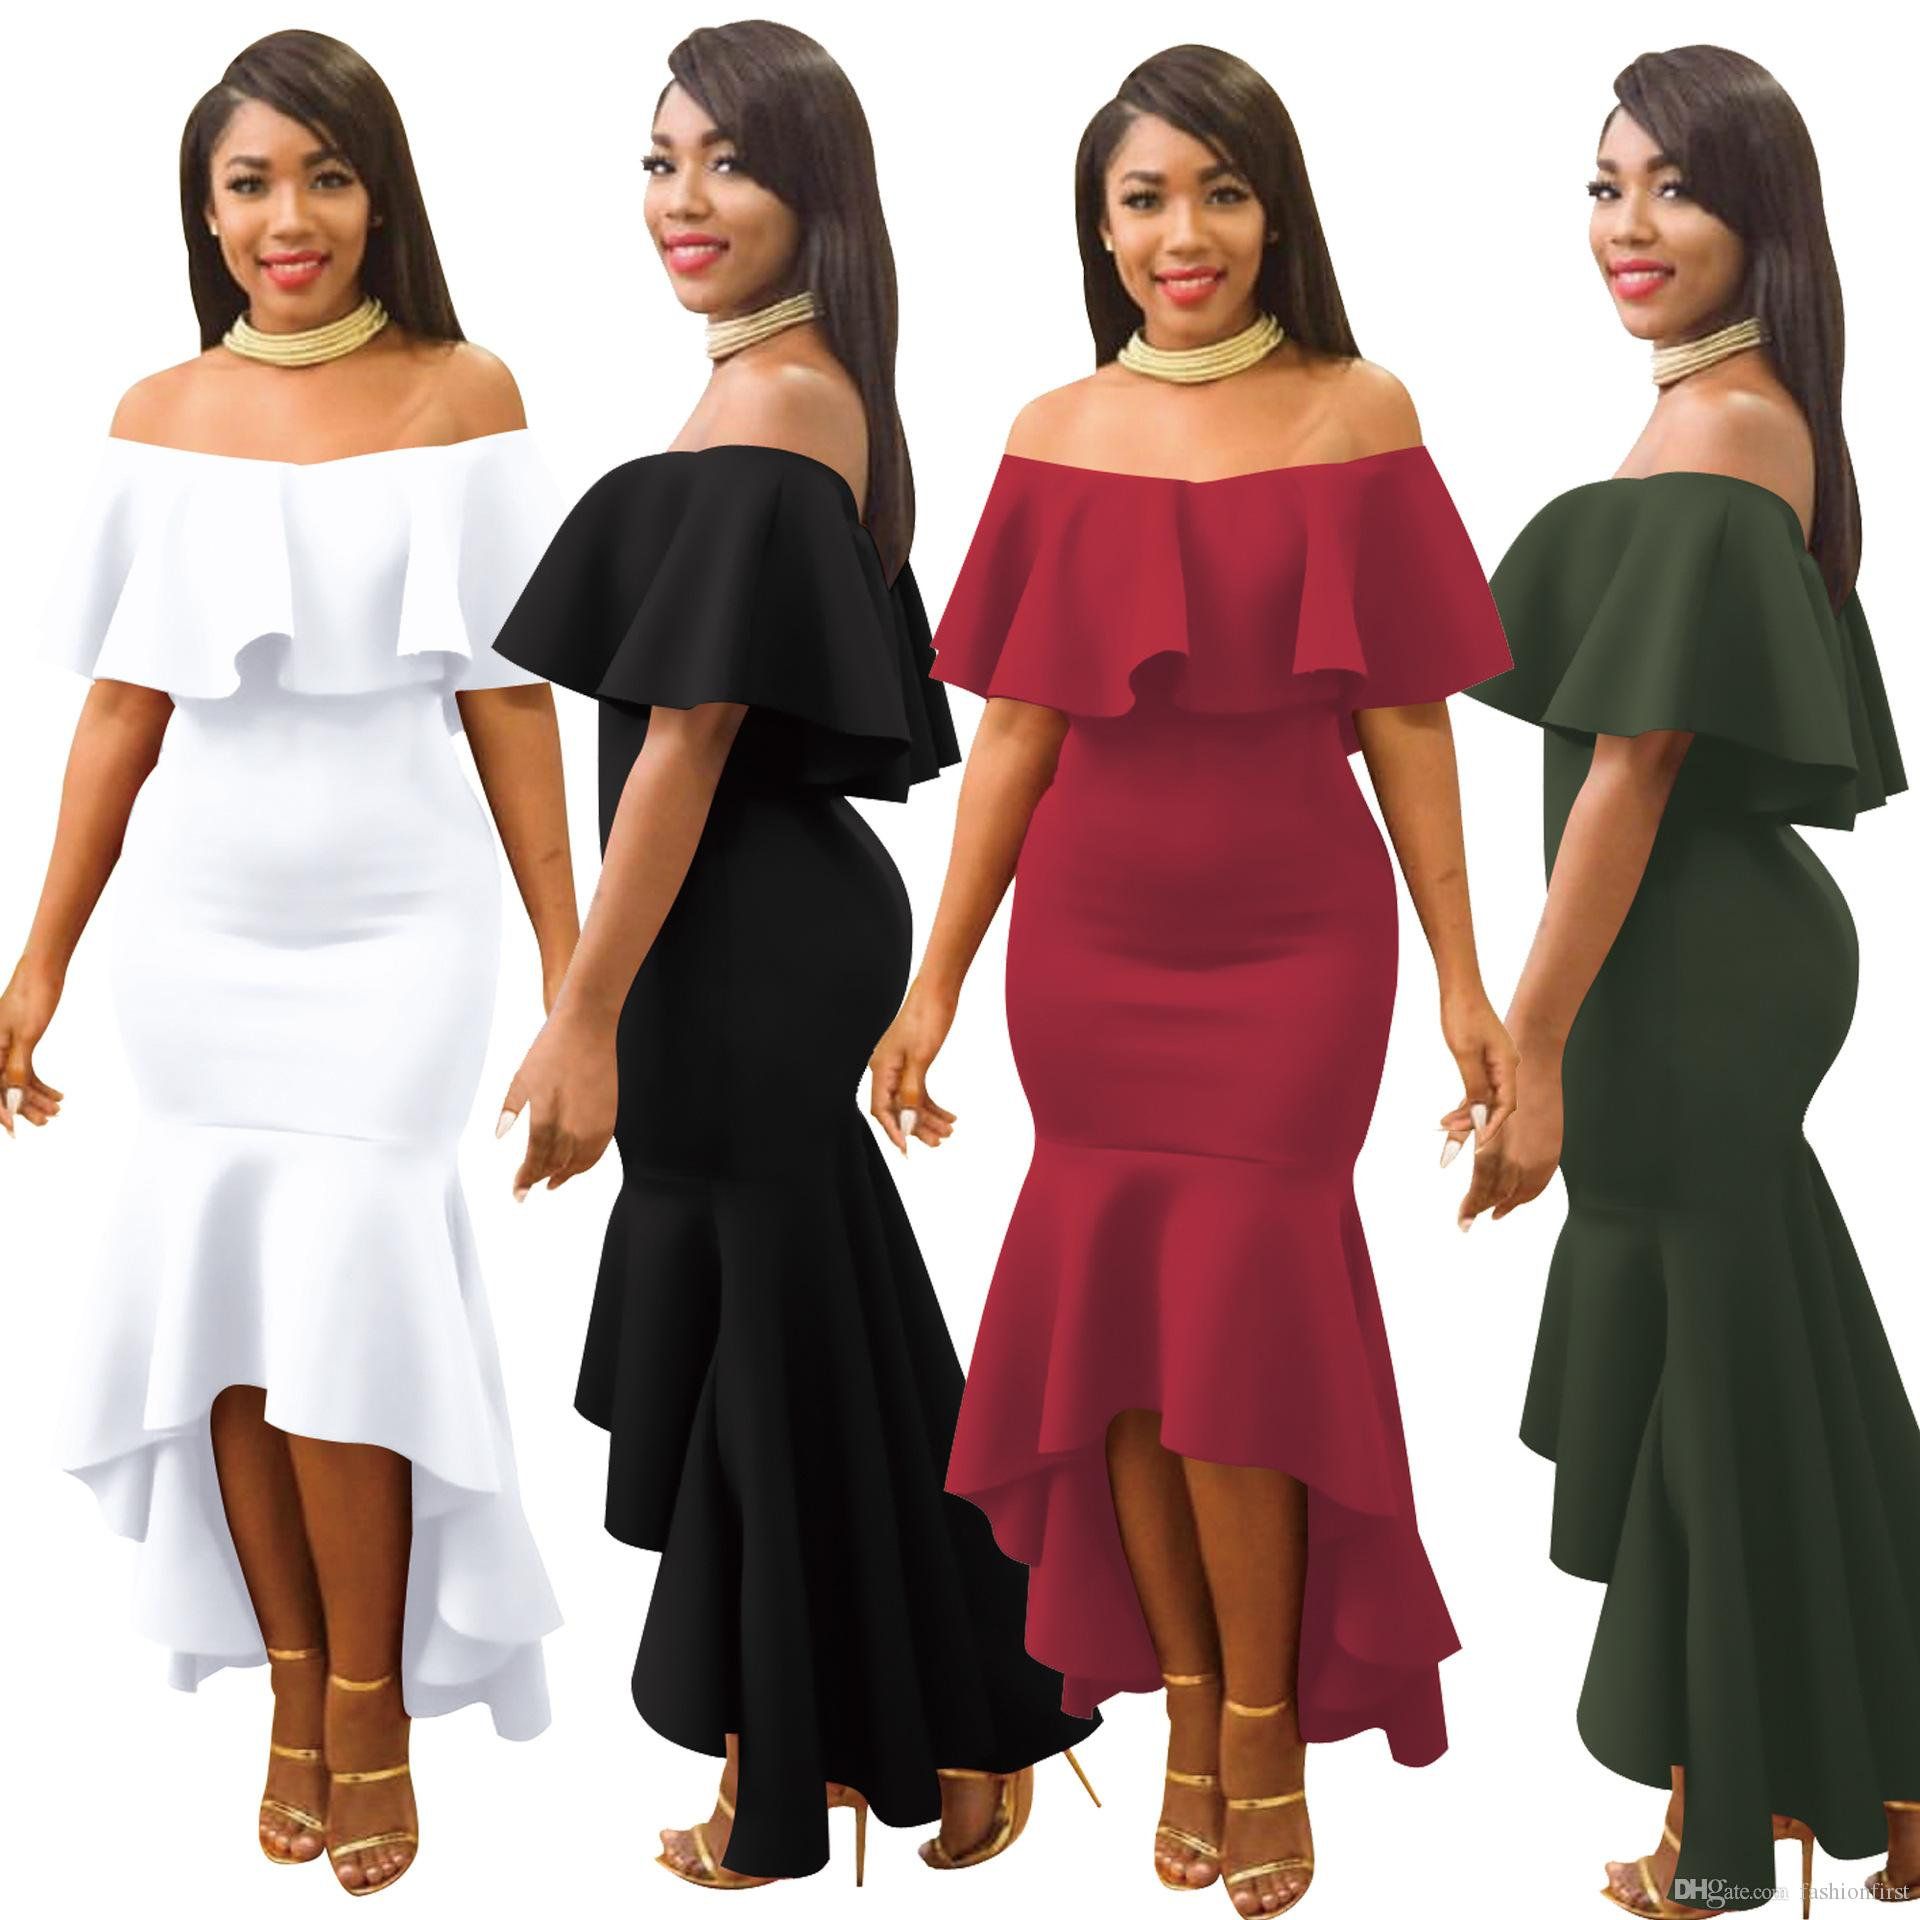 Women Ruffle Off Shoulder Dress Elegant Wine Red Army Green Party Ruffled  Dress Romantic Urban Boho Dress Sequin Dresses Sweater Dresses From  Fashionfirst 69b8baf72